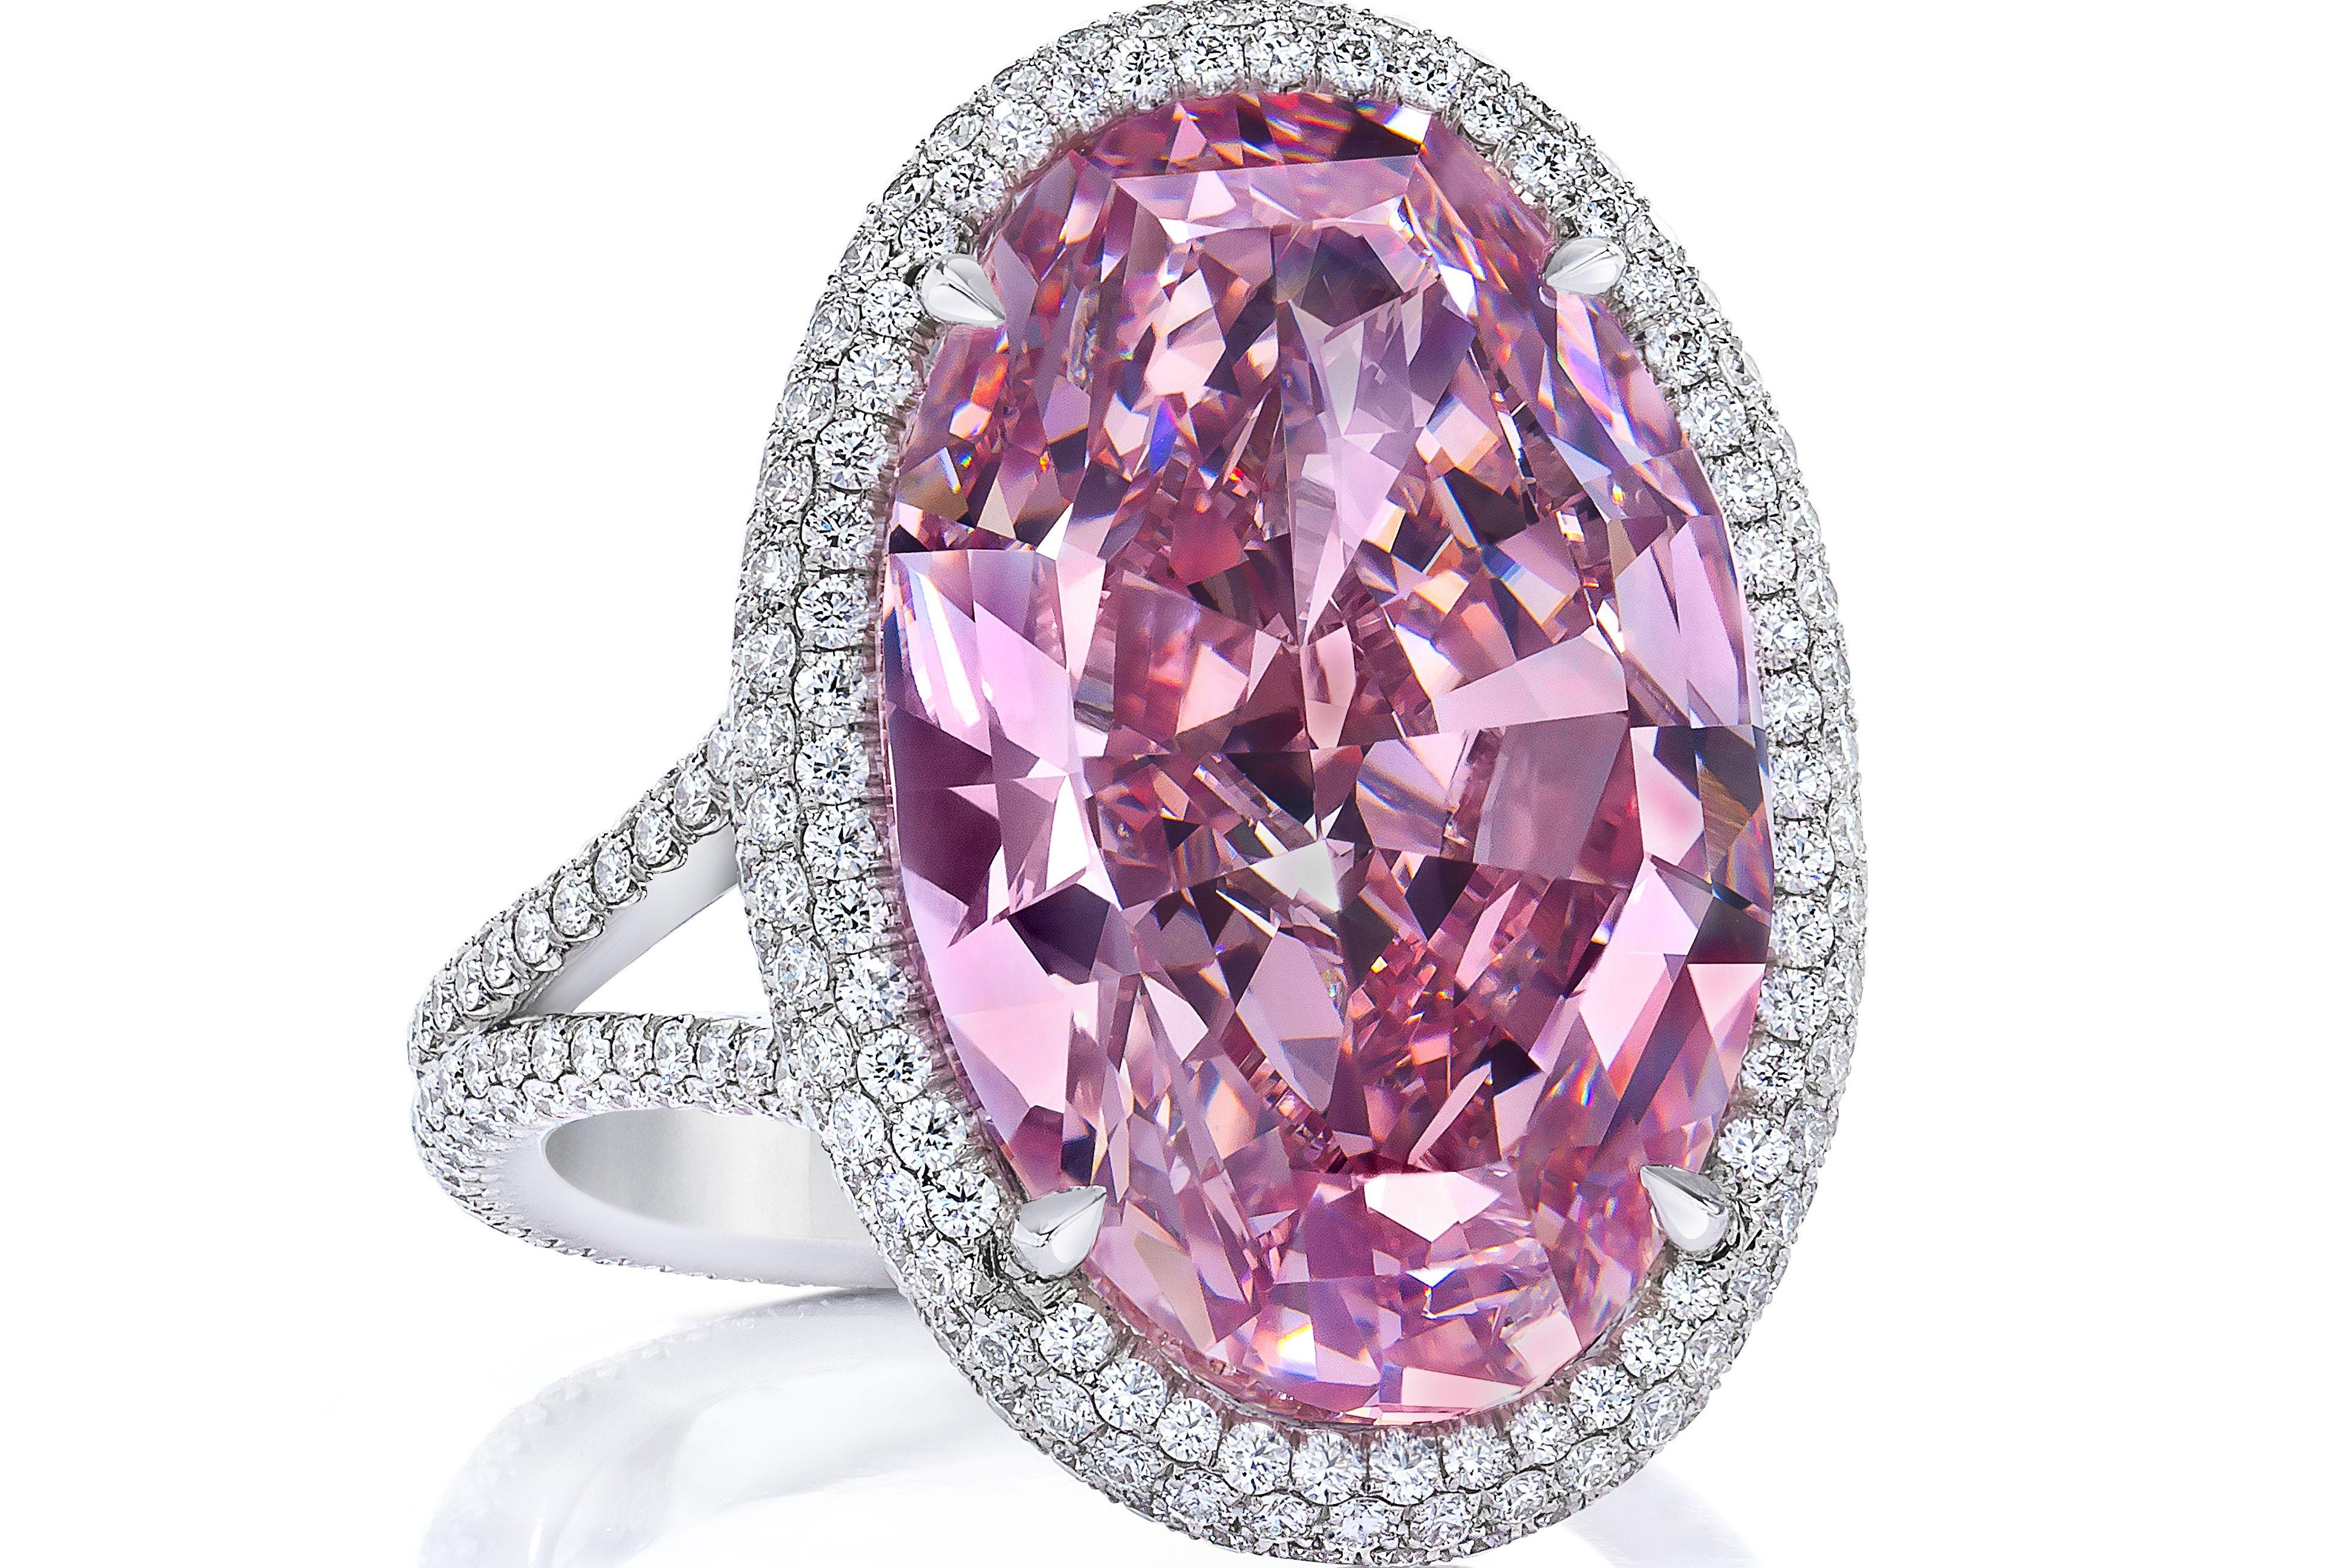 Pink Promise\' Diamond Fetches $32 Million at Auction   Diamond ...